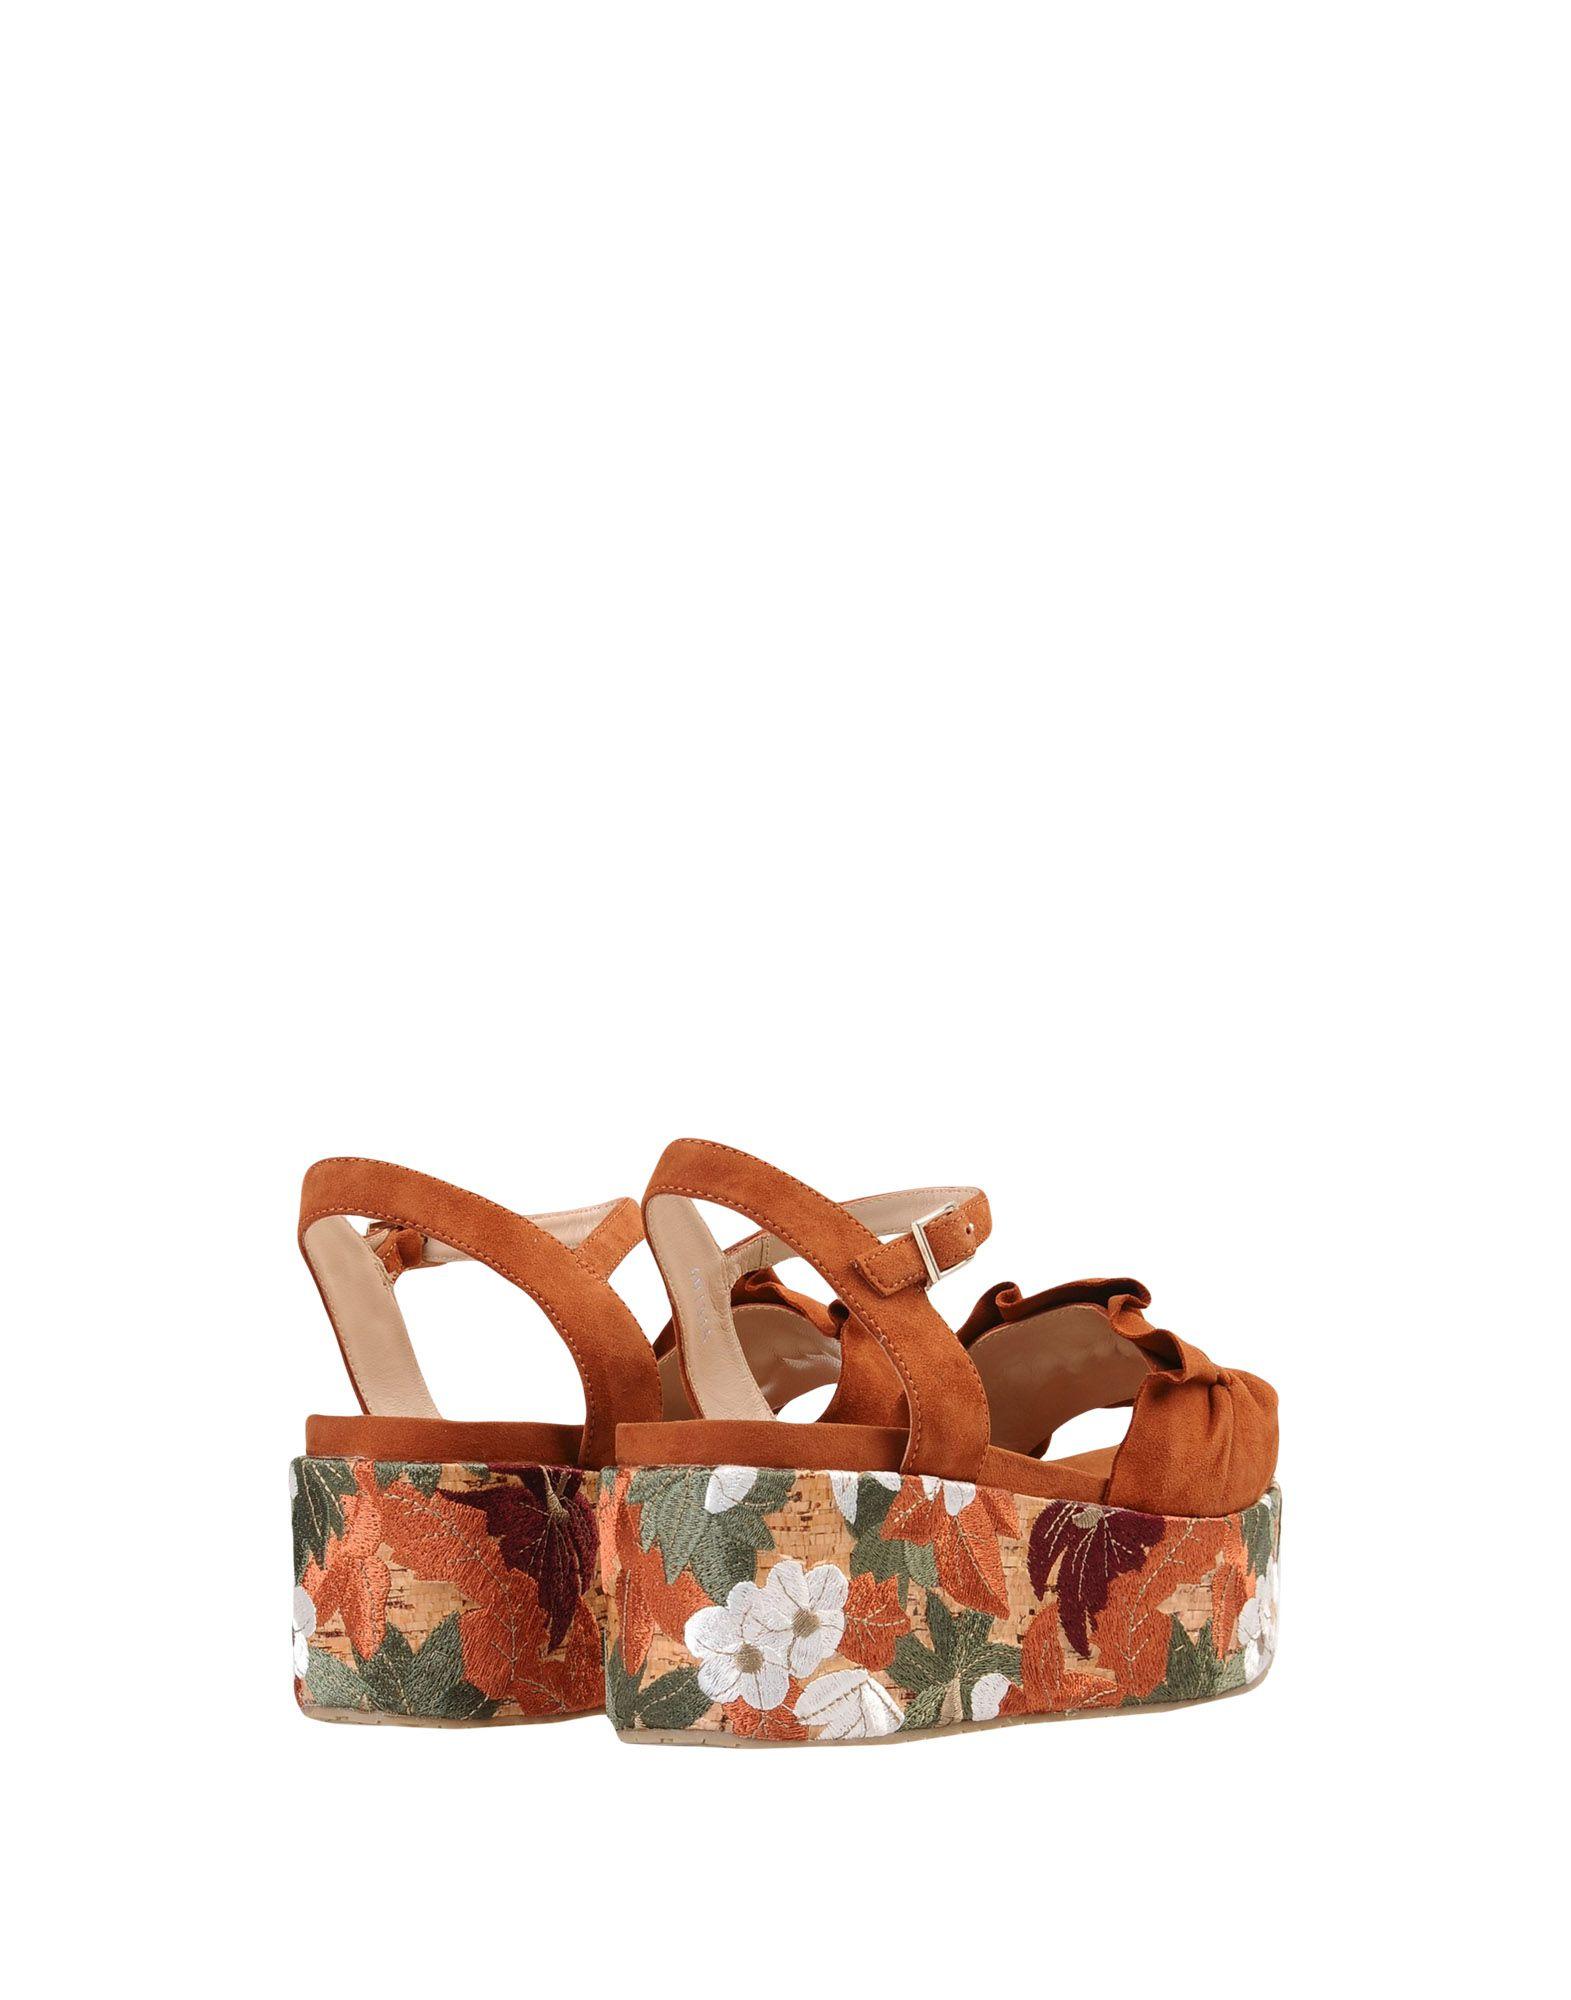 Bruno Premi Gute Sandalen Damen  11464415JD Gute Premi Qualität beliebte Schuhe d8f1c5